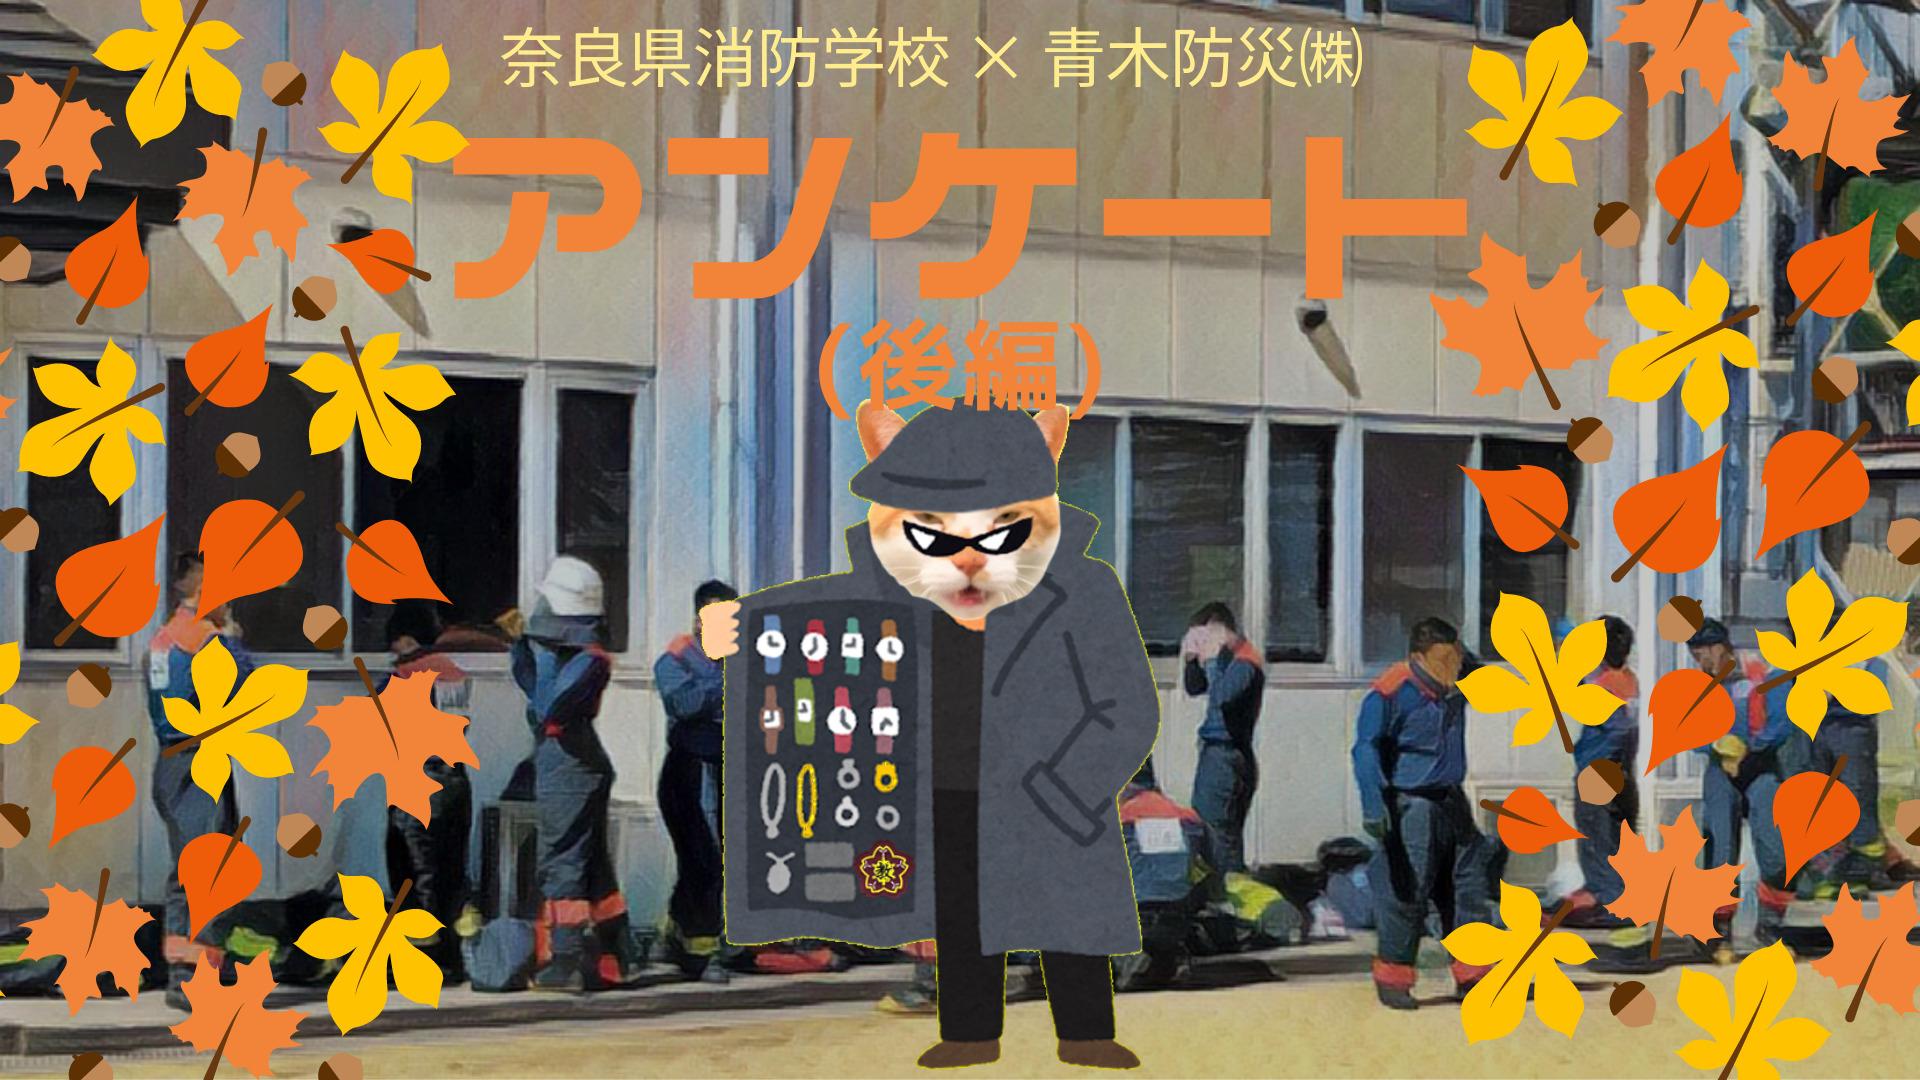 奈良県消防学校 アンケート